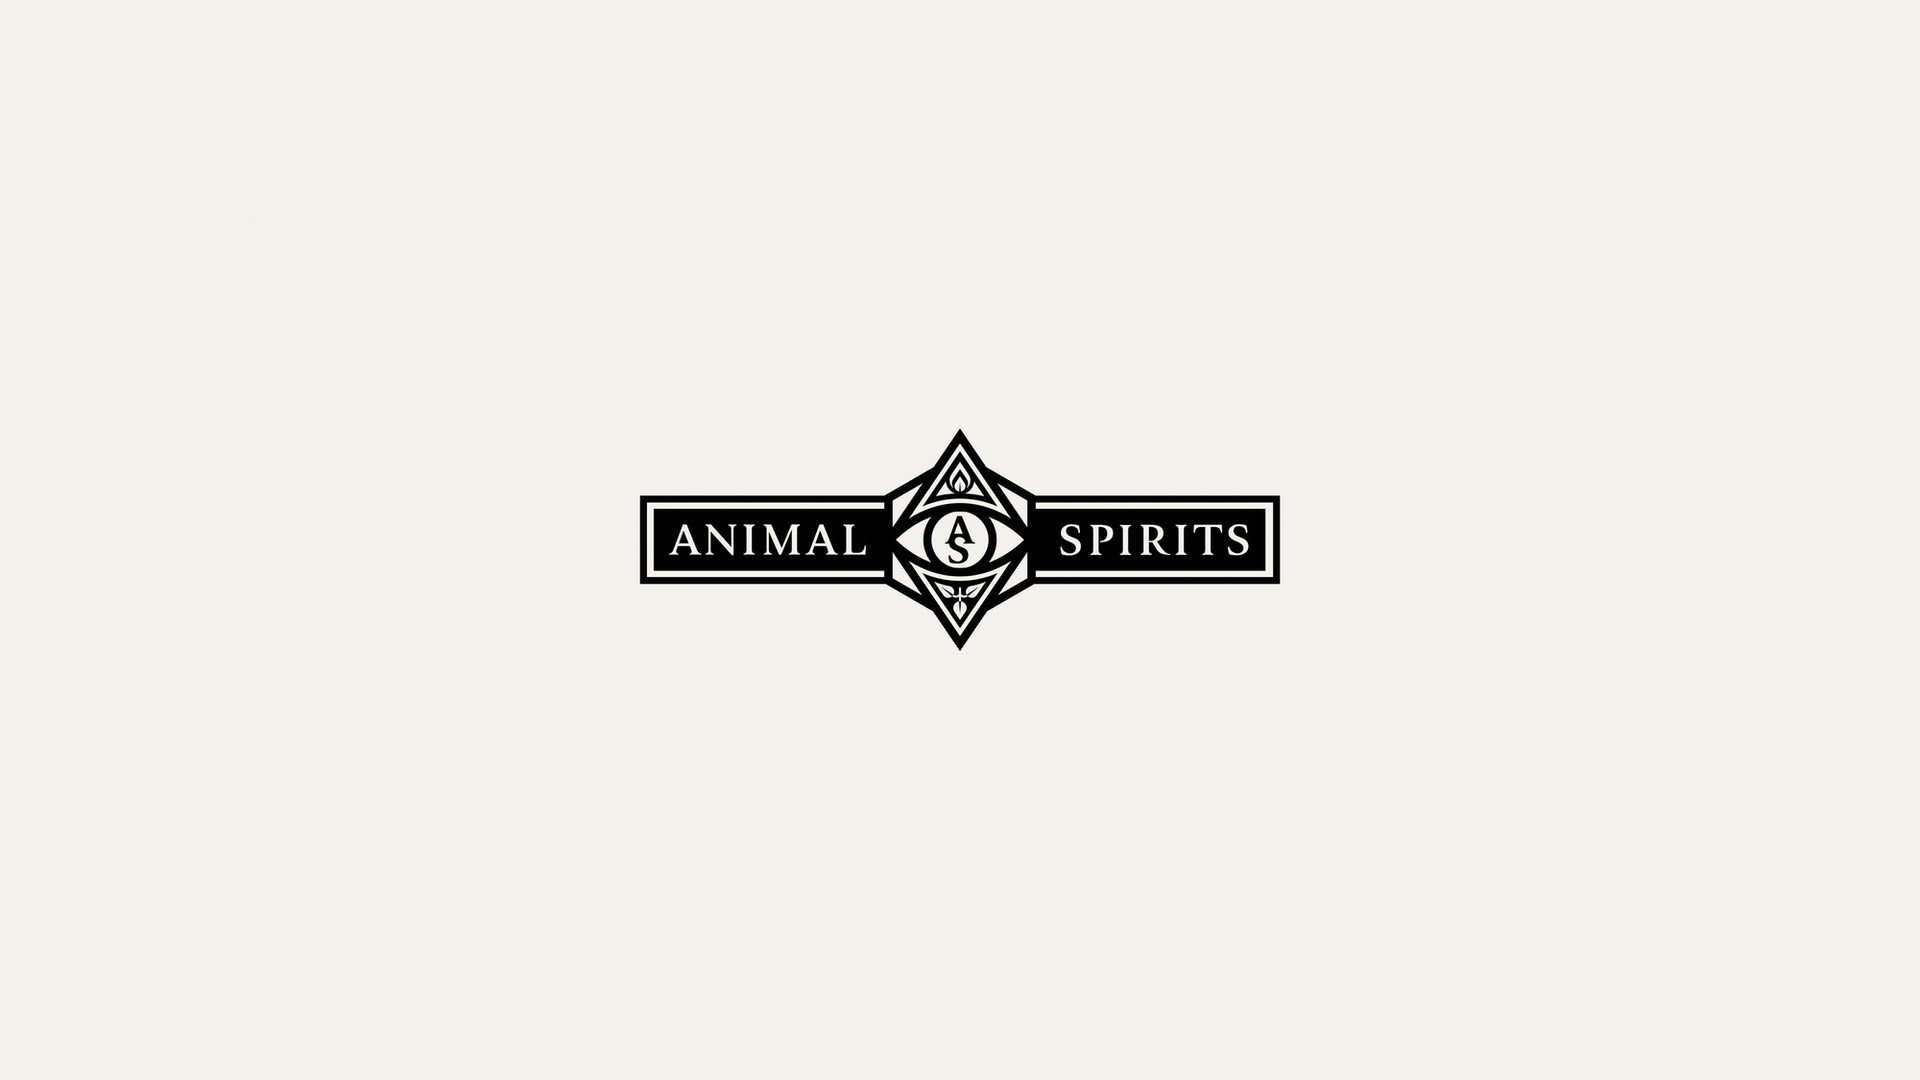 Animal Spirits by The Design Laboratory